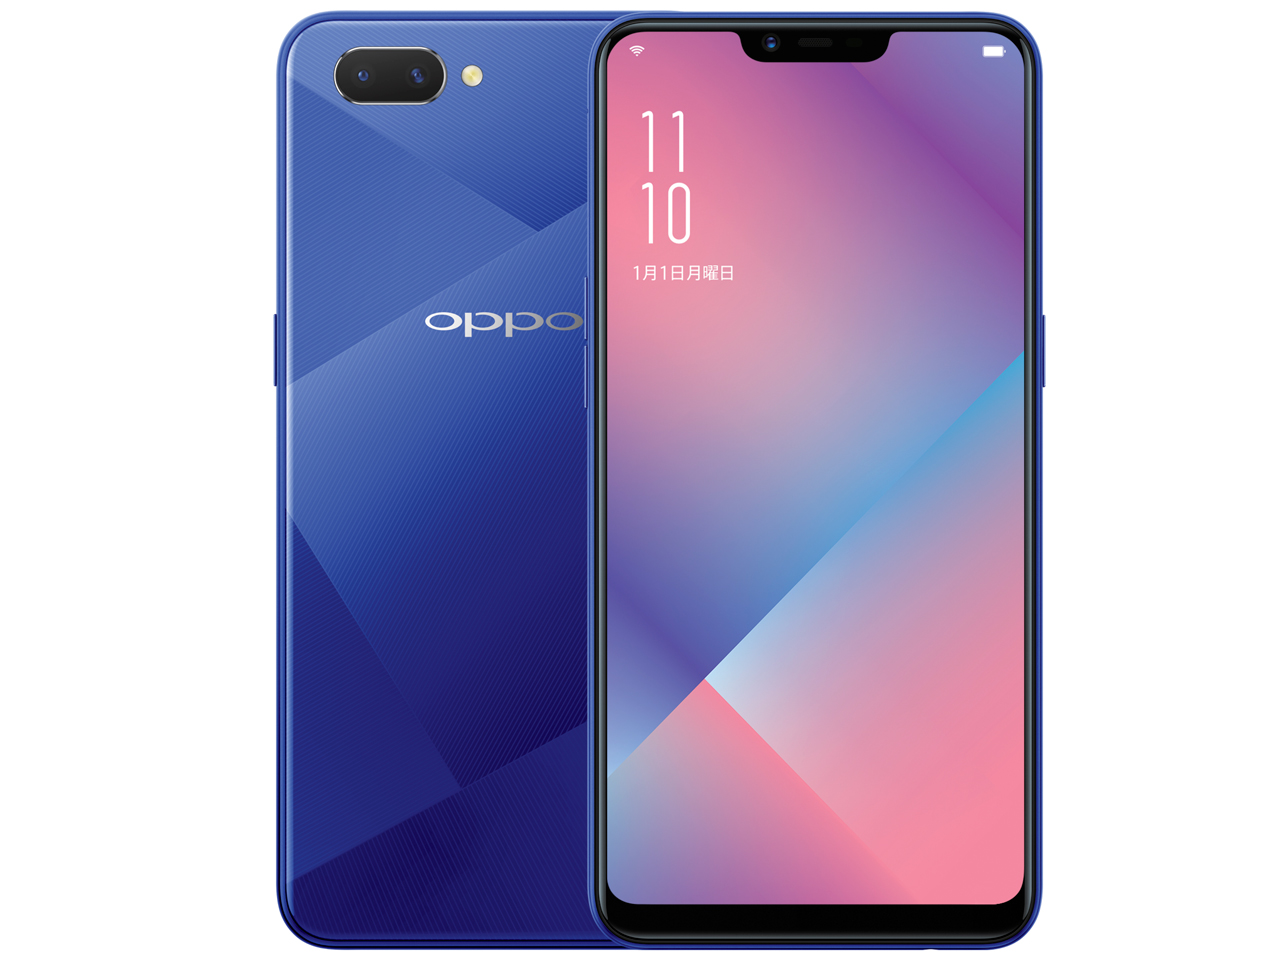 OPPO R15 Neo 3GBメモリー SIMフリー [ダイヤモンドブルー] 2018年秋モデル JAN:4580038873310